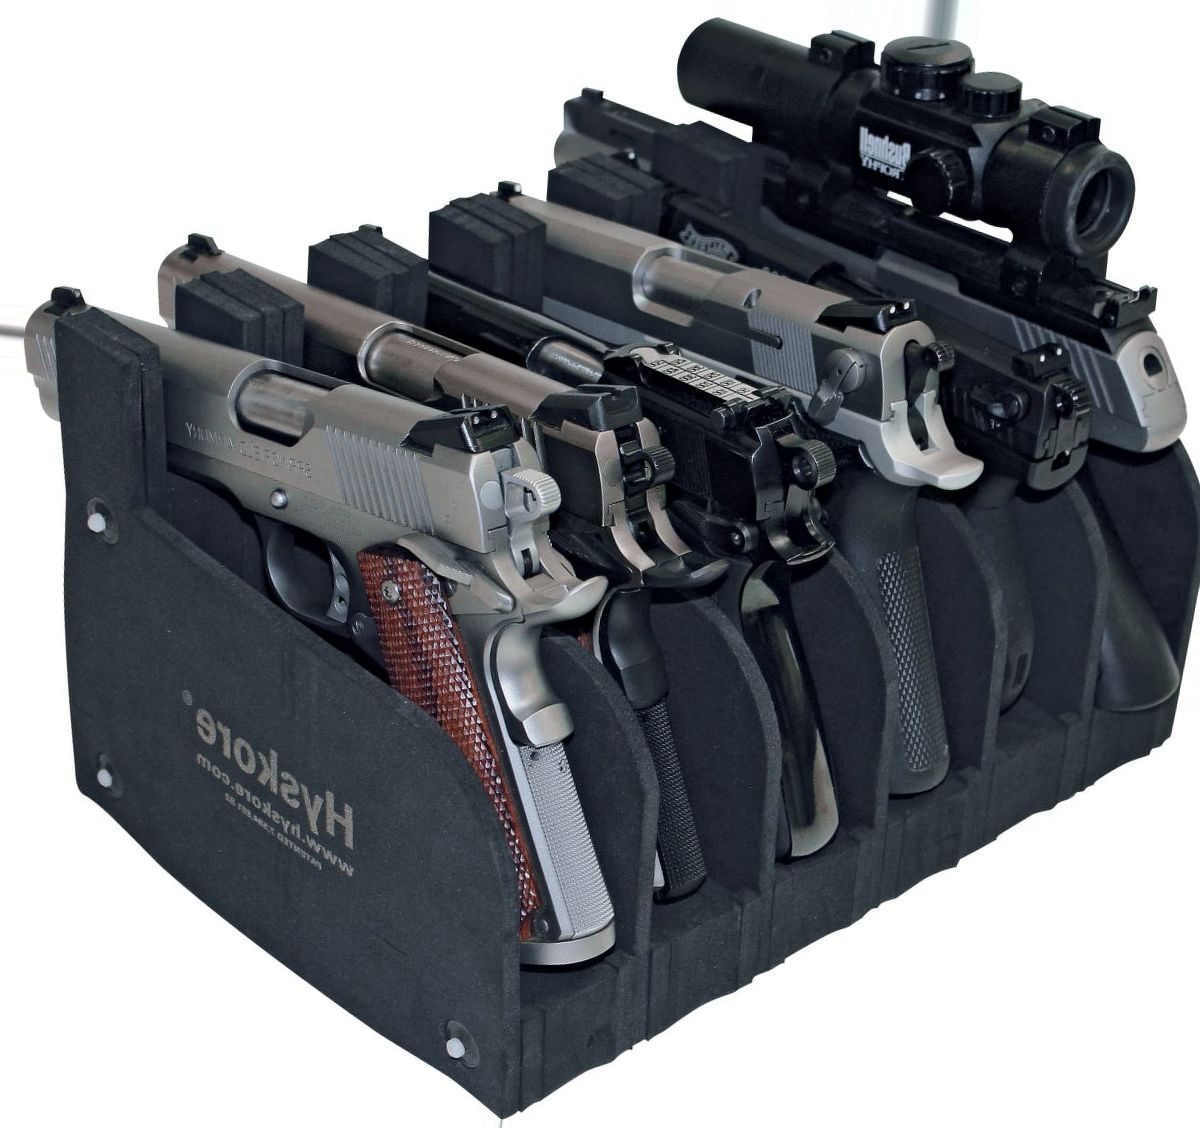 Hyskore® Modular Pistol Racks